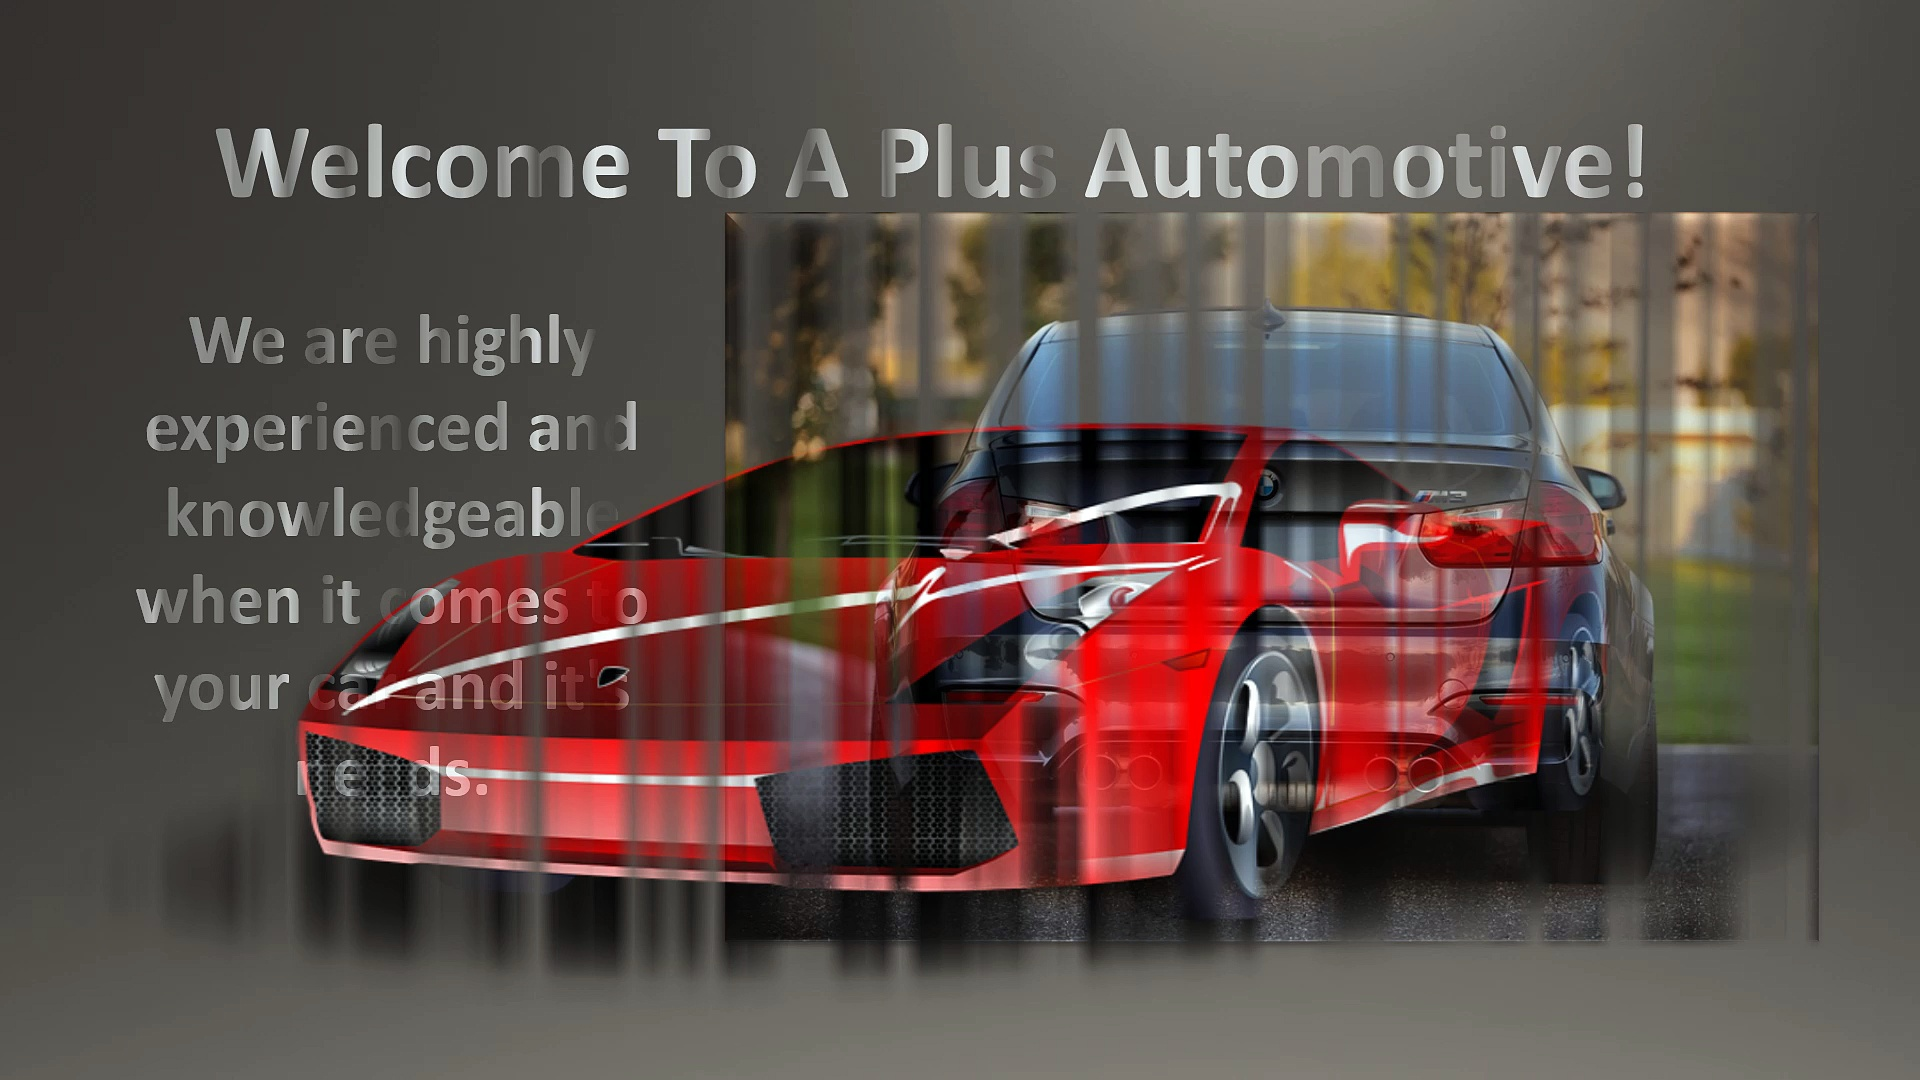 Aplus Automotive